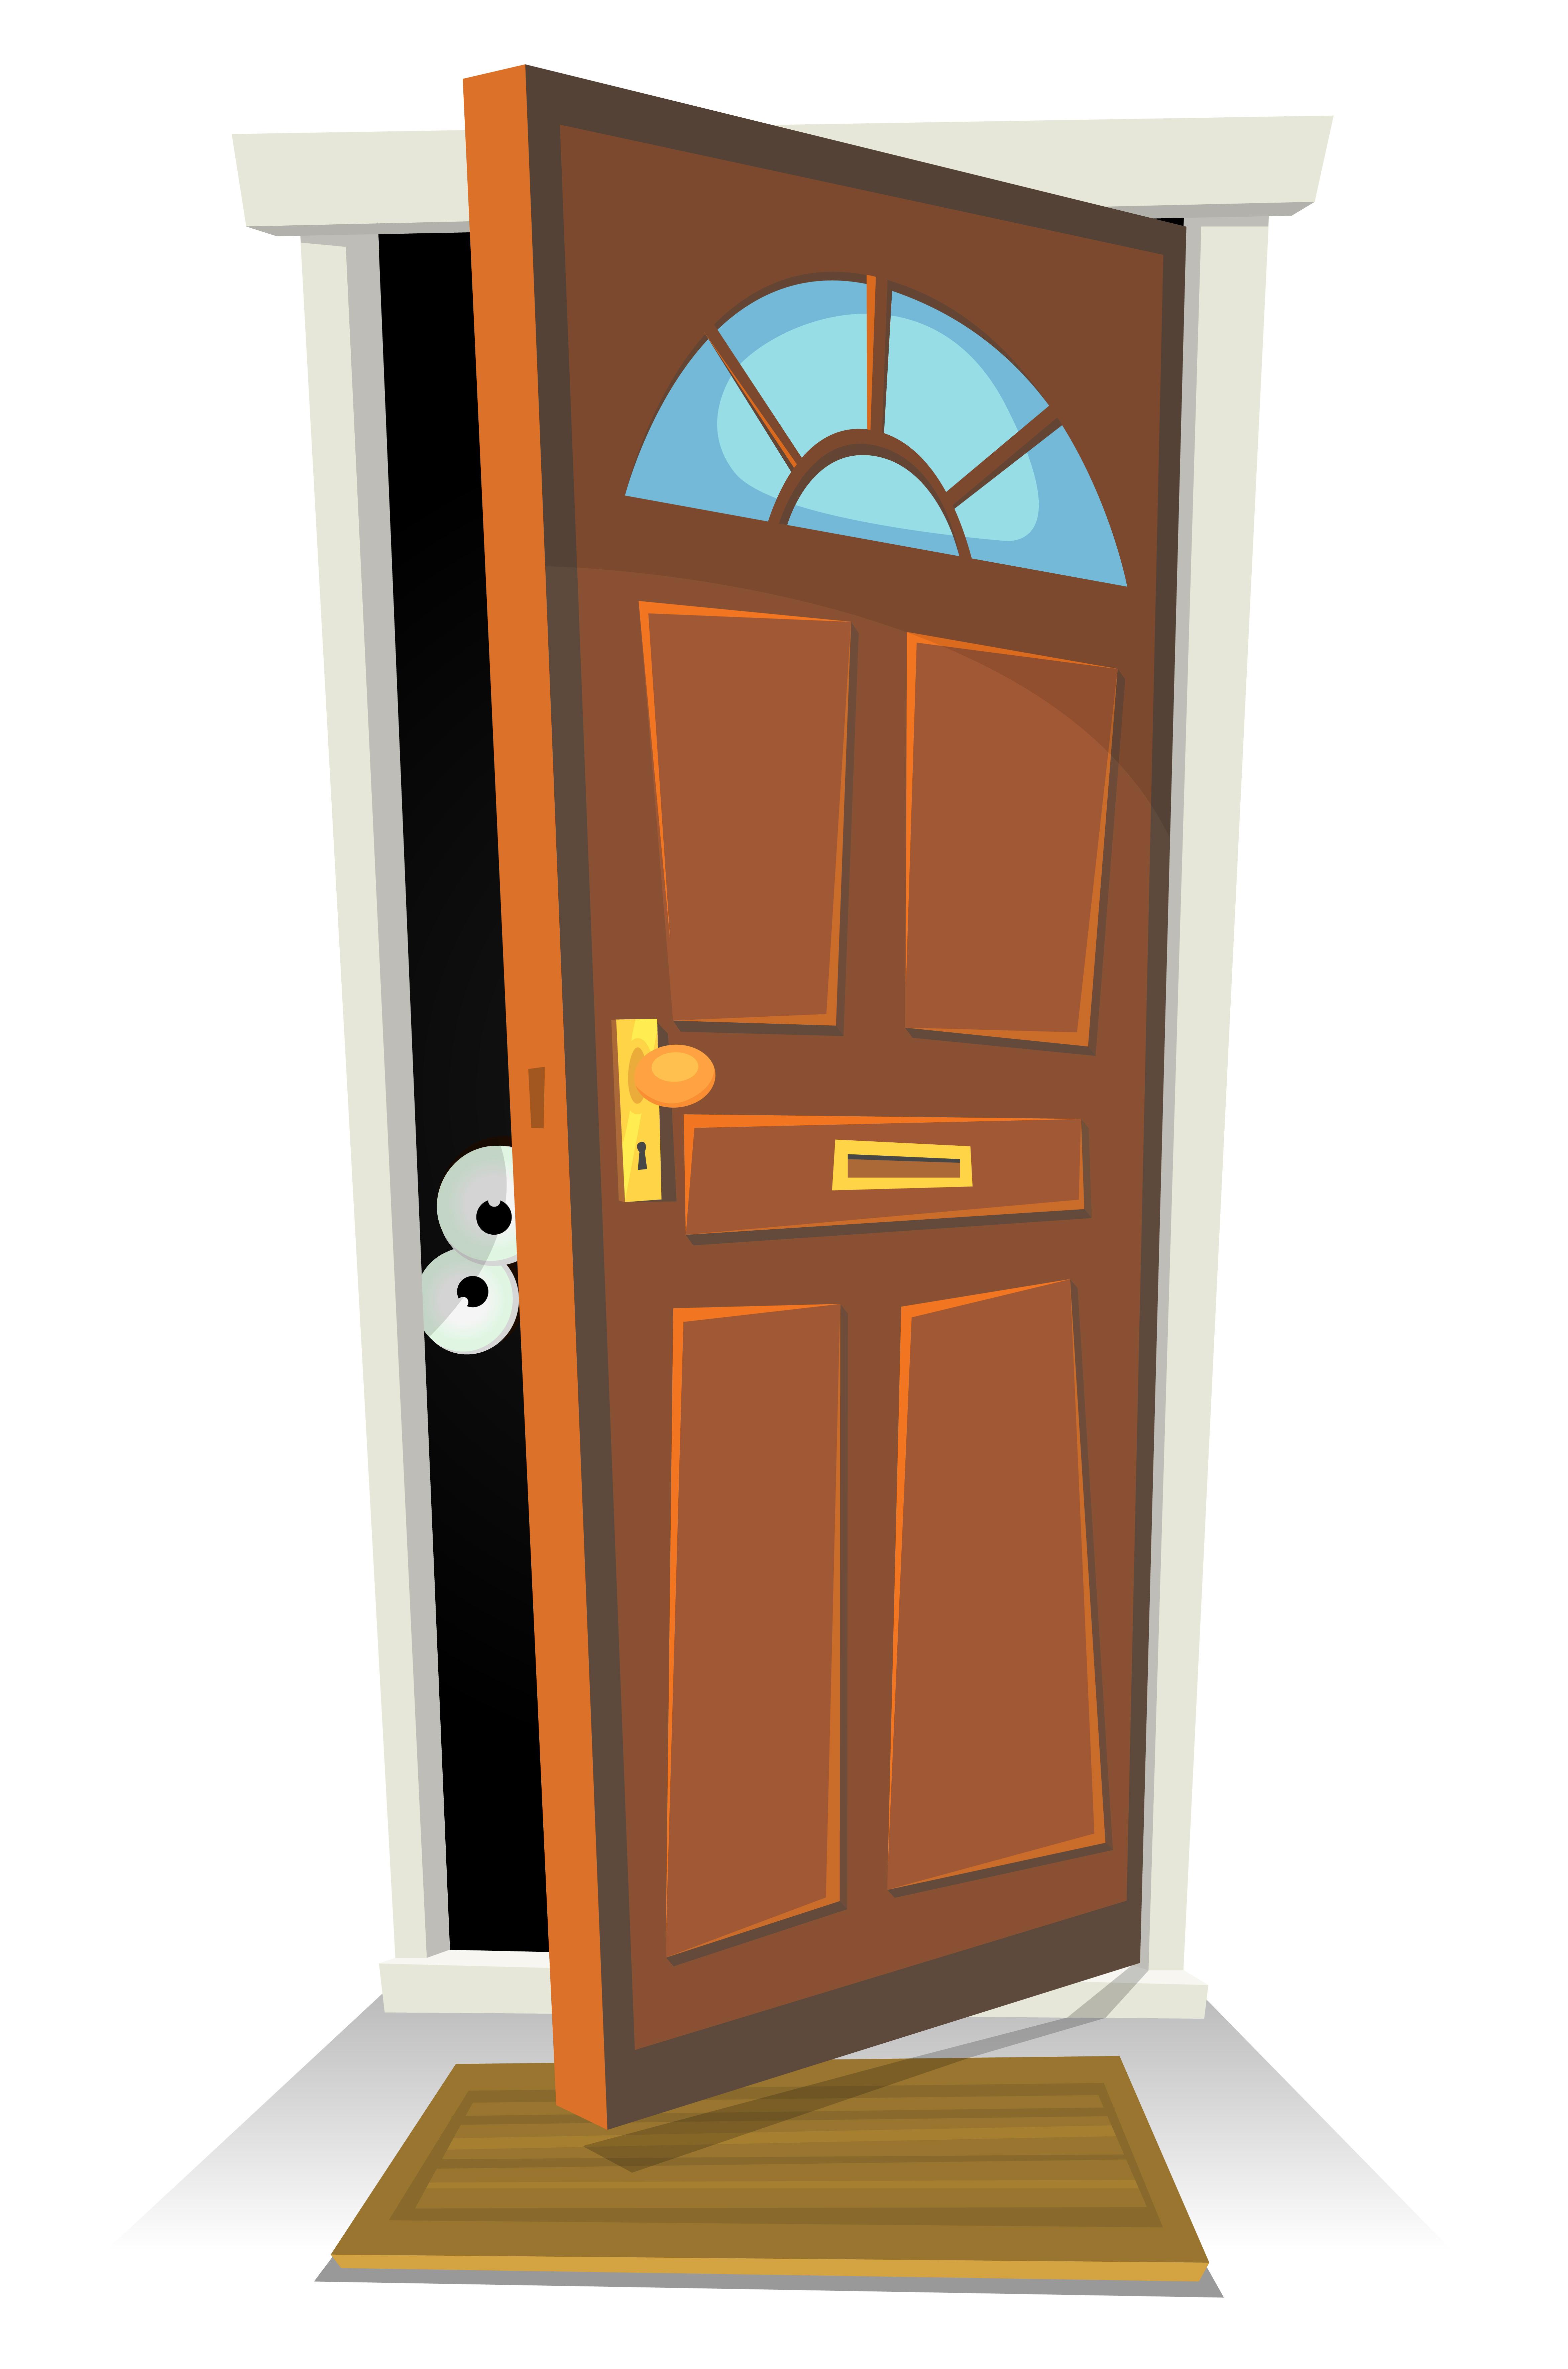 Something Or Someone Behind The Door Download Free Vectors Clipart Graphics Vector Art